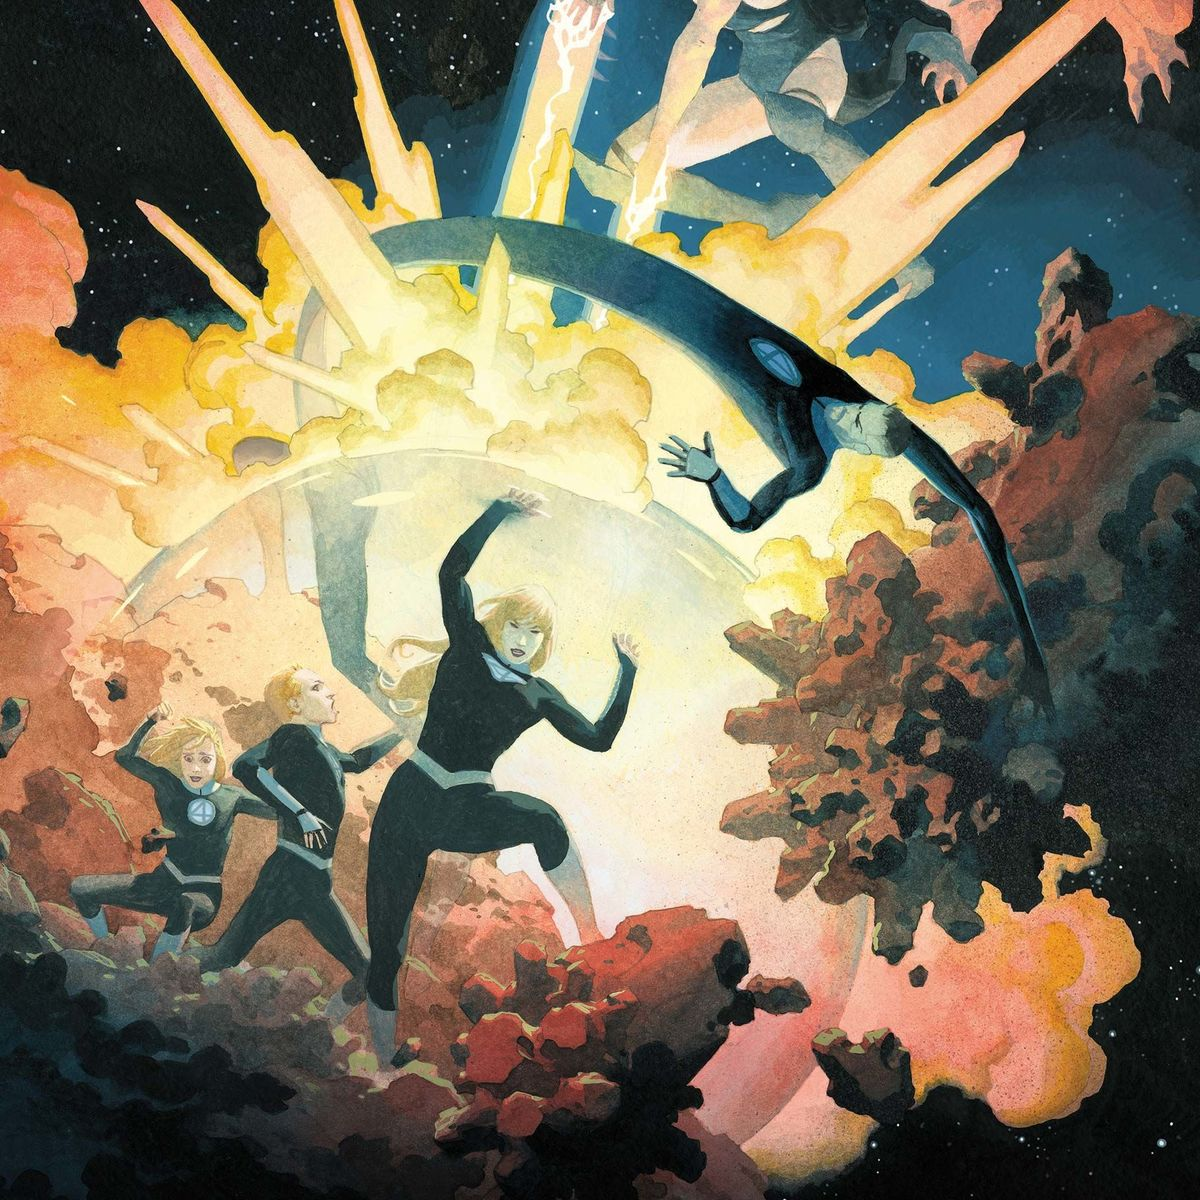 Fantastic Four #2 cover